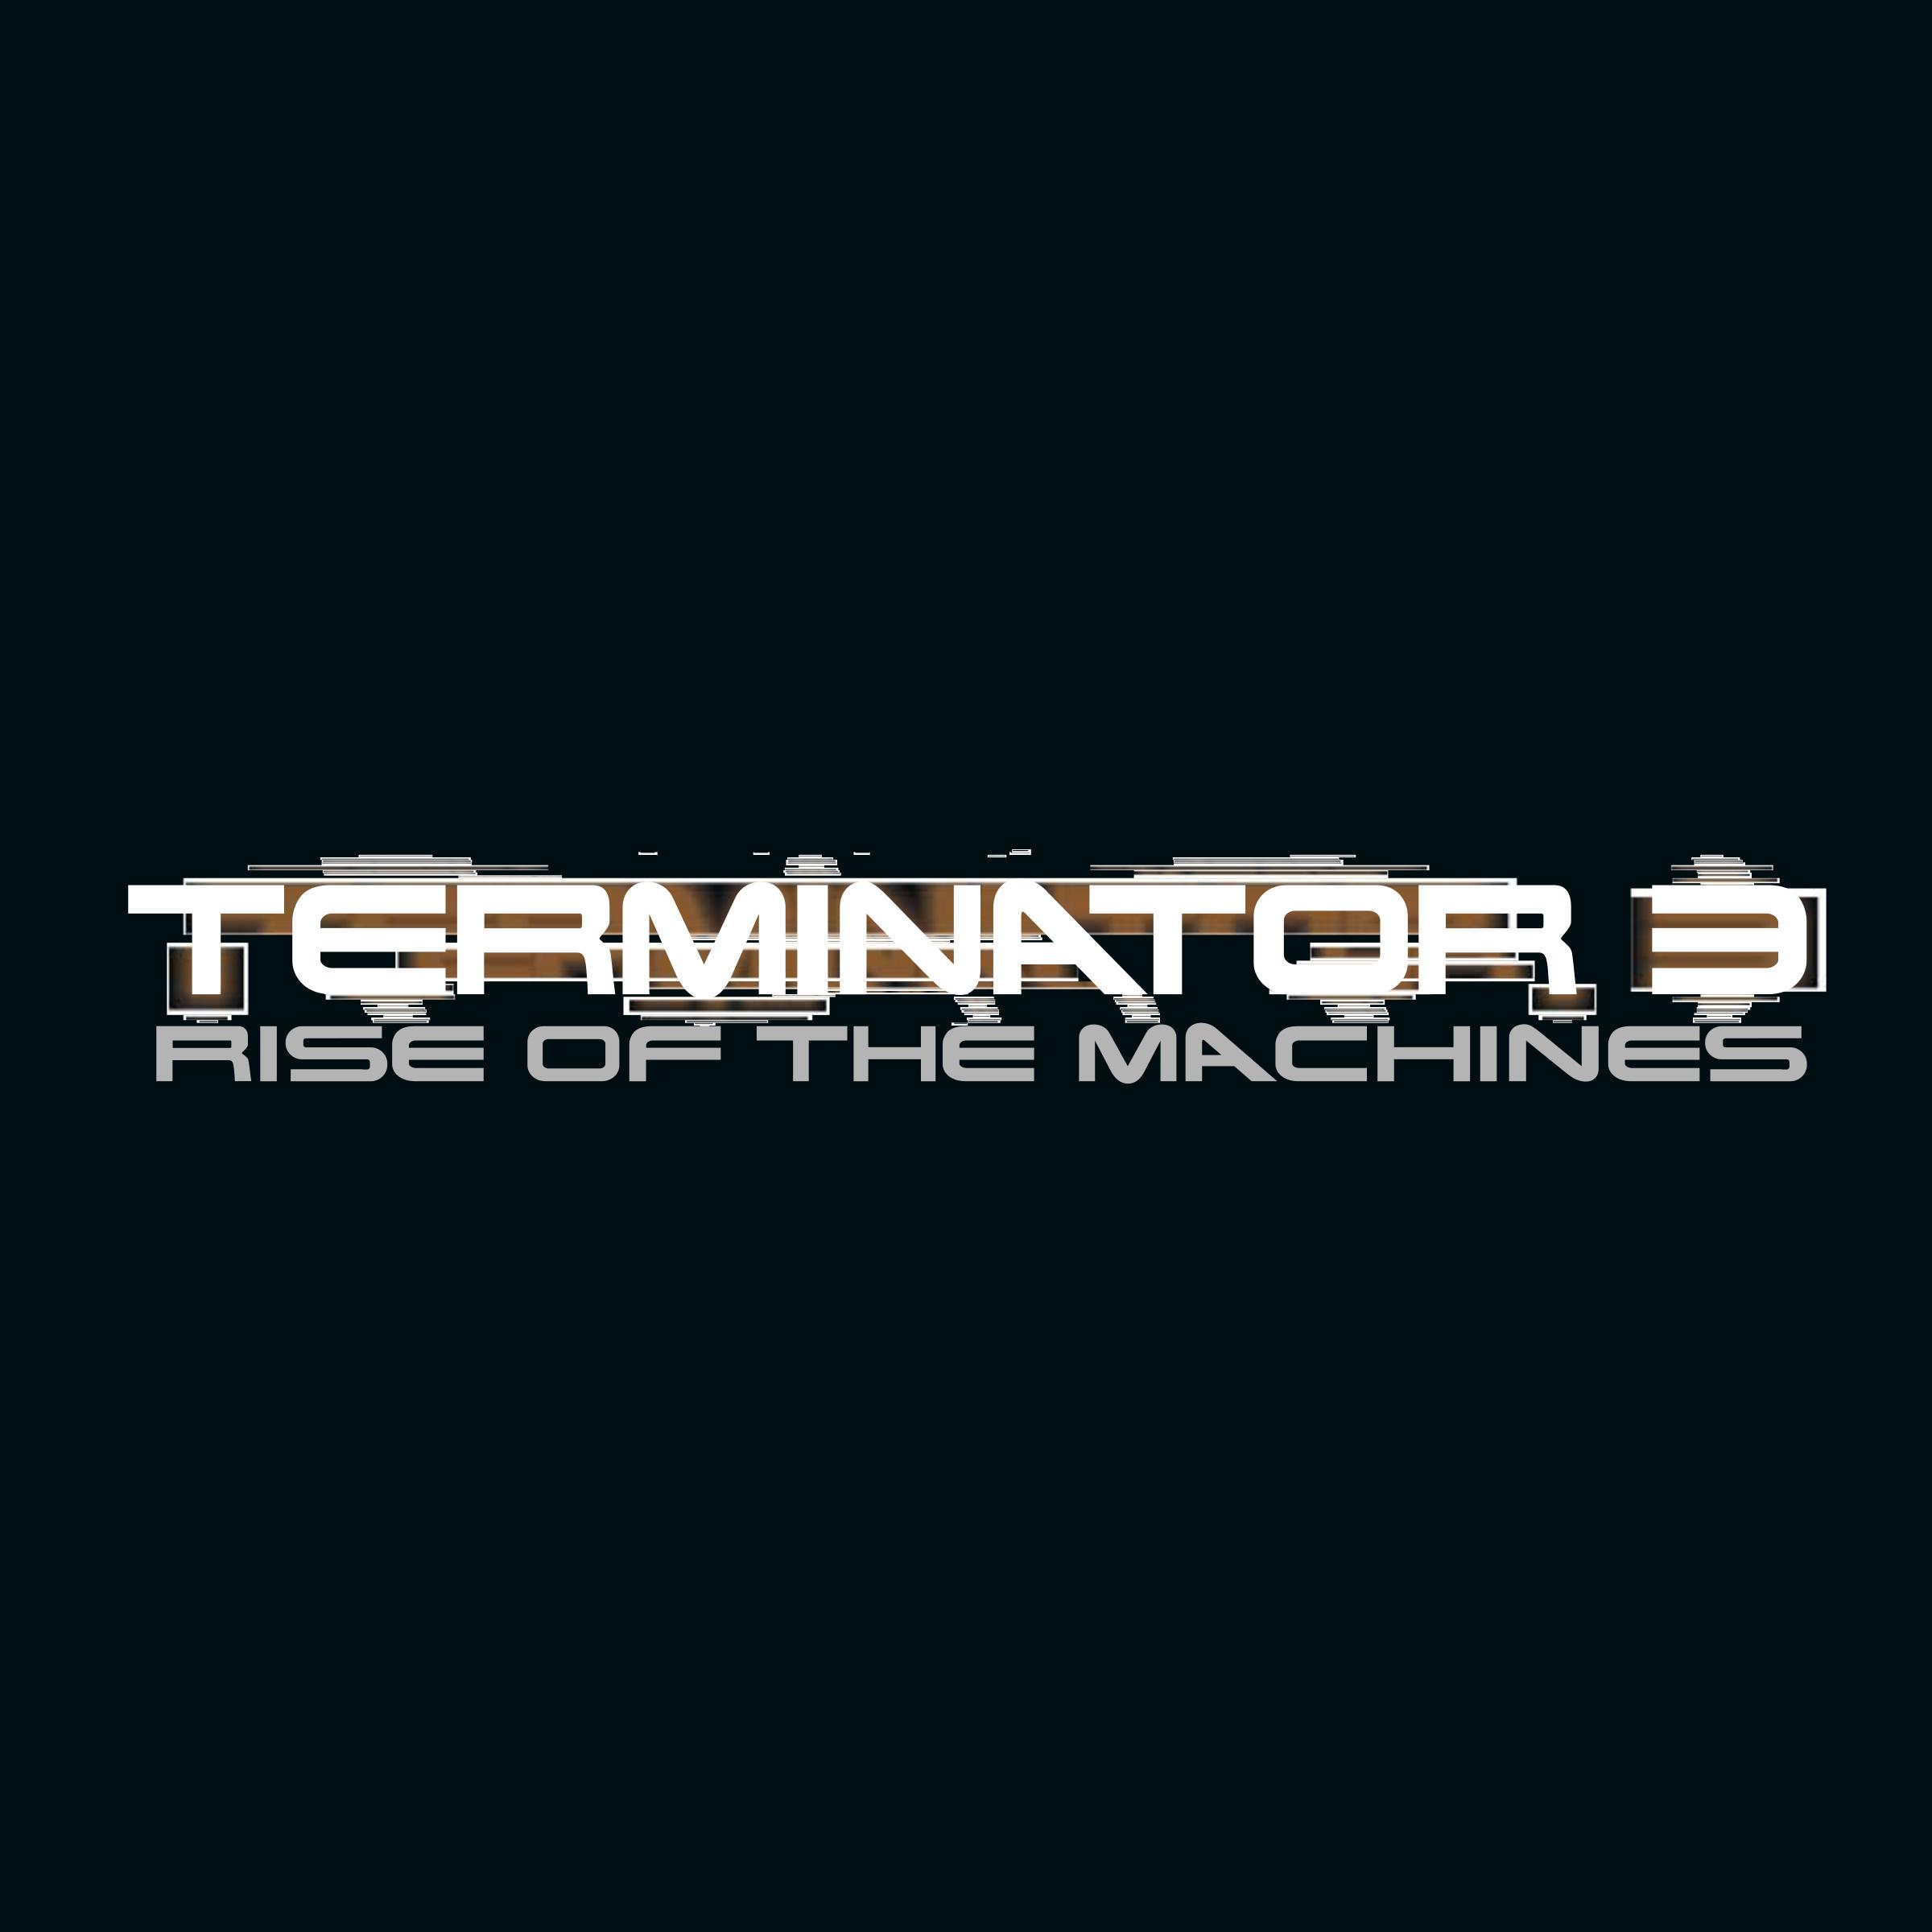 Terminator 3 Logo Png Transparent 3 Logo Logos Film Logo